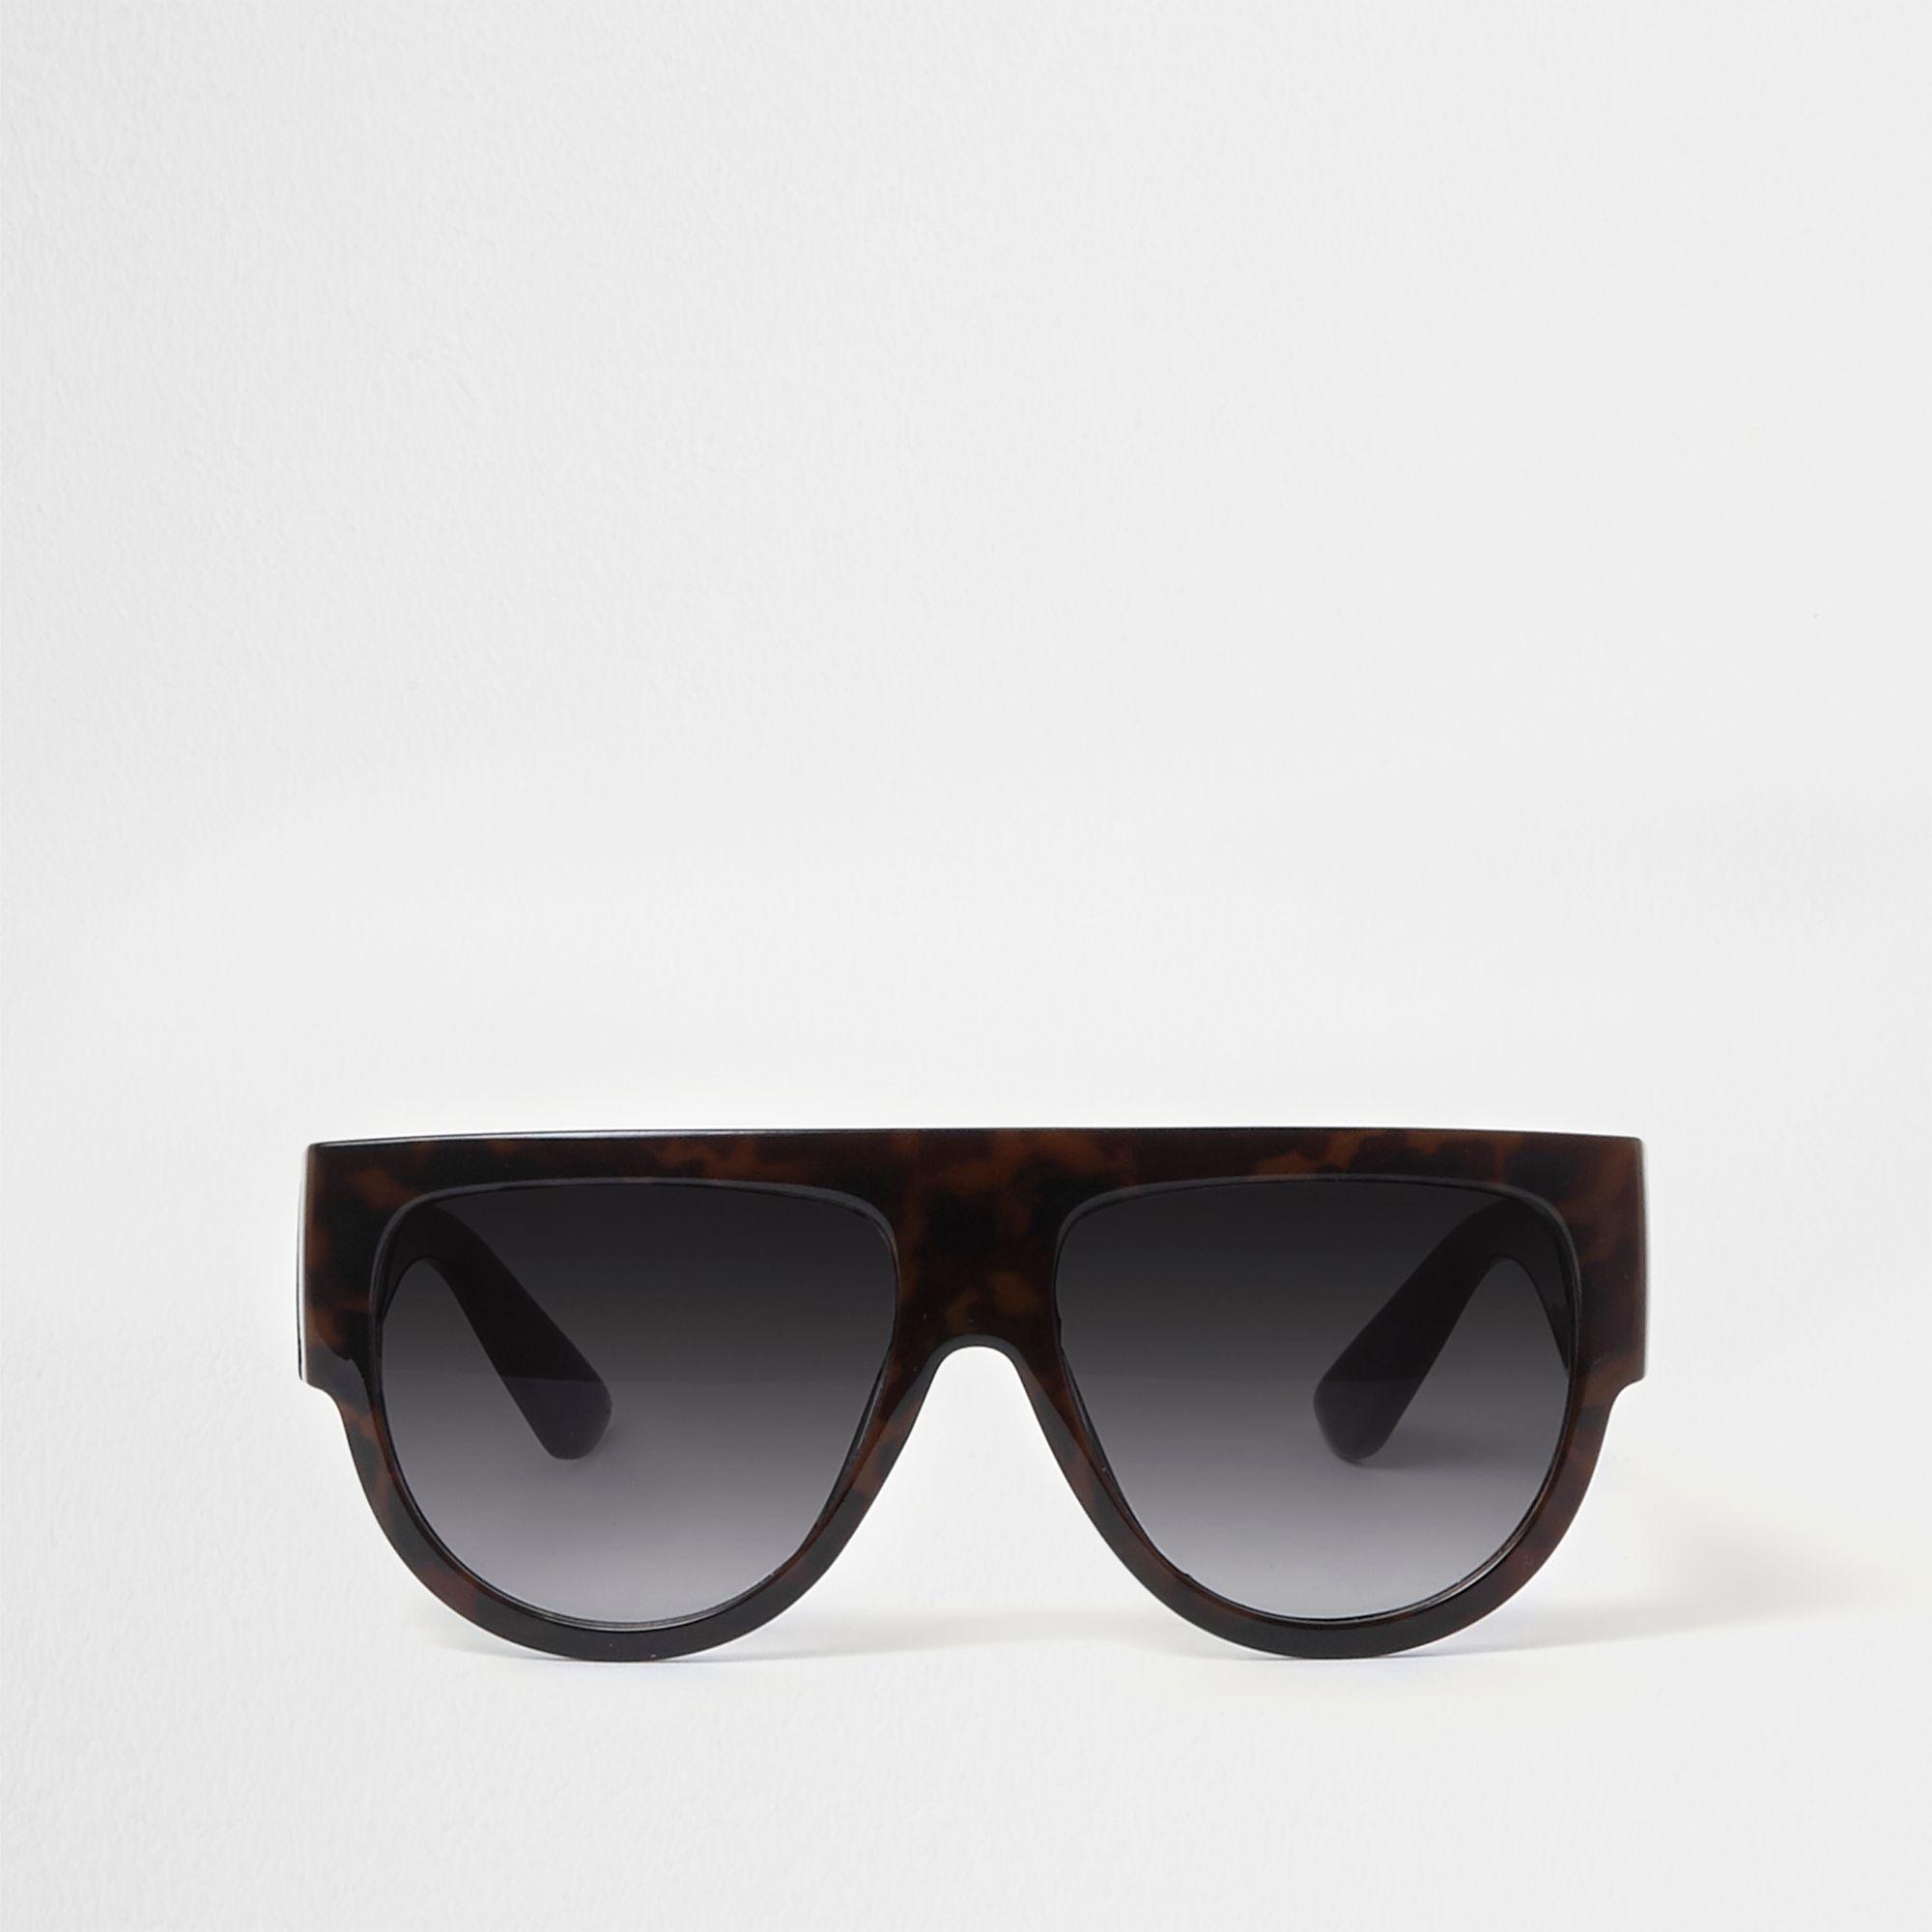 9dc68e574d5c River Island Flat Top Tortoiseshell Sunglasses in Black - Lyst